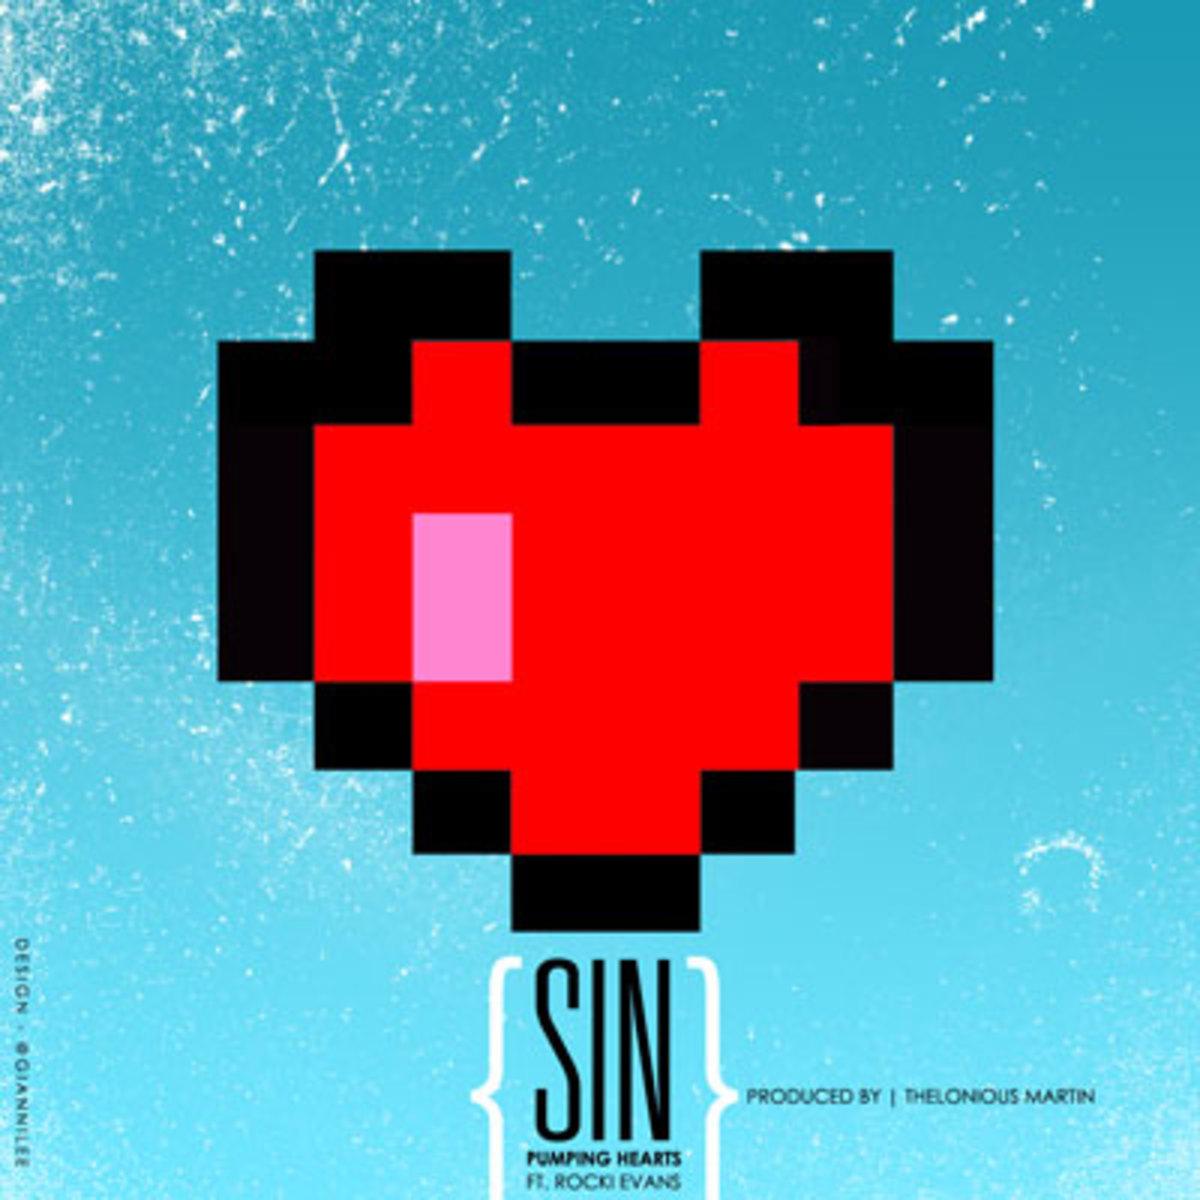 sin-pumpinghearts.jpg